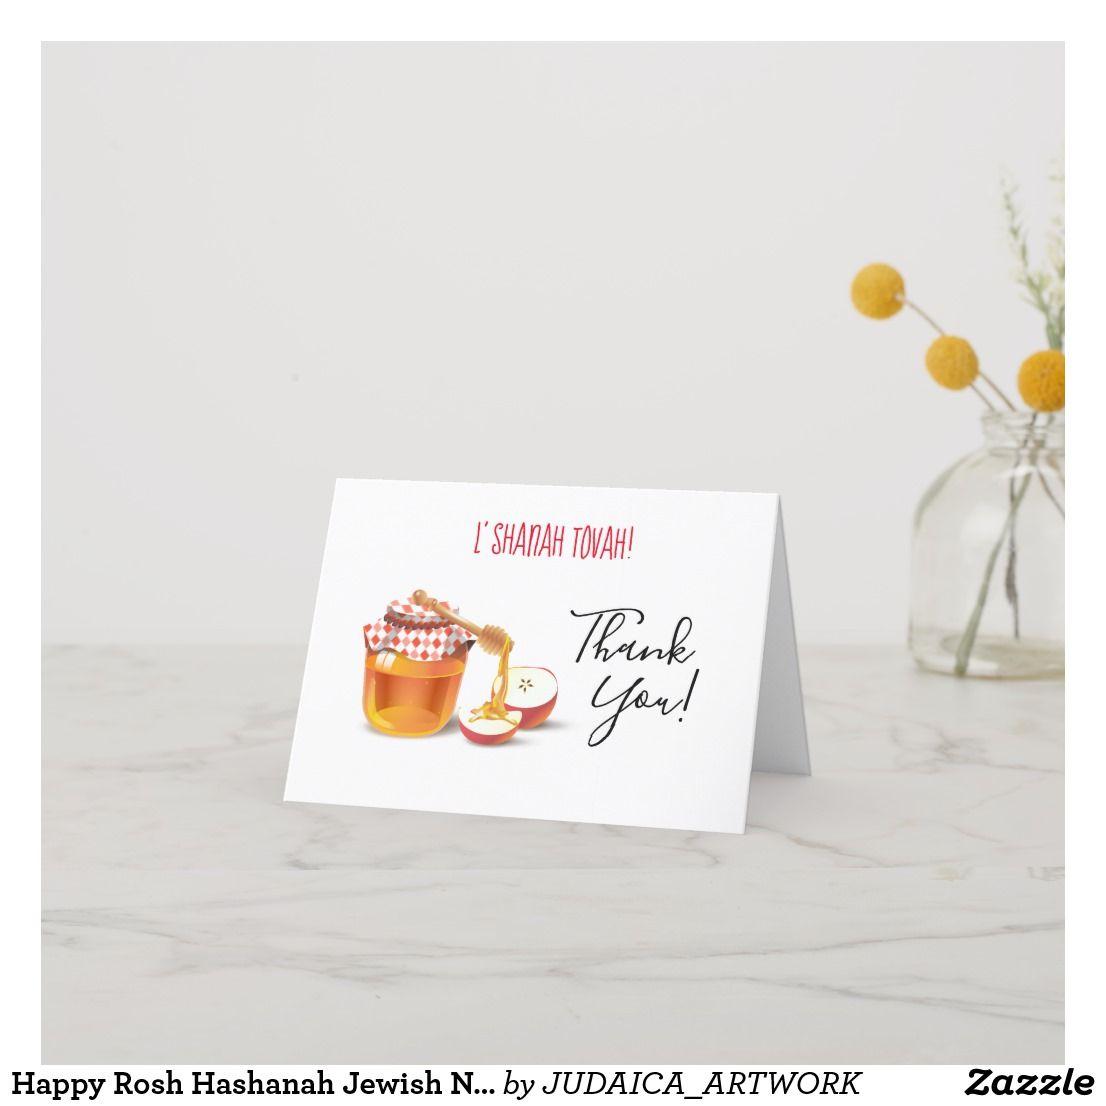 Happy Rosh Hashanah Jewish New Year Honey & Apple Thank You Card | Zazzle.com